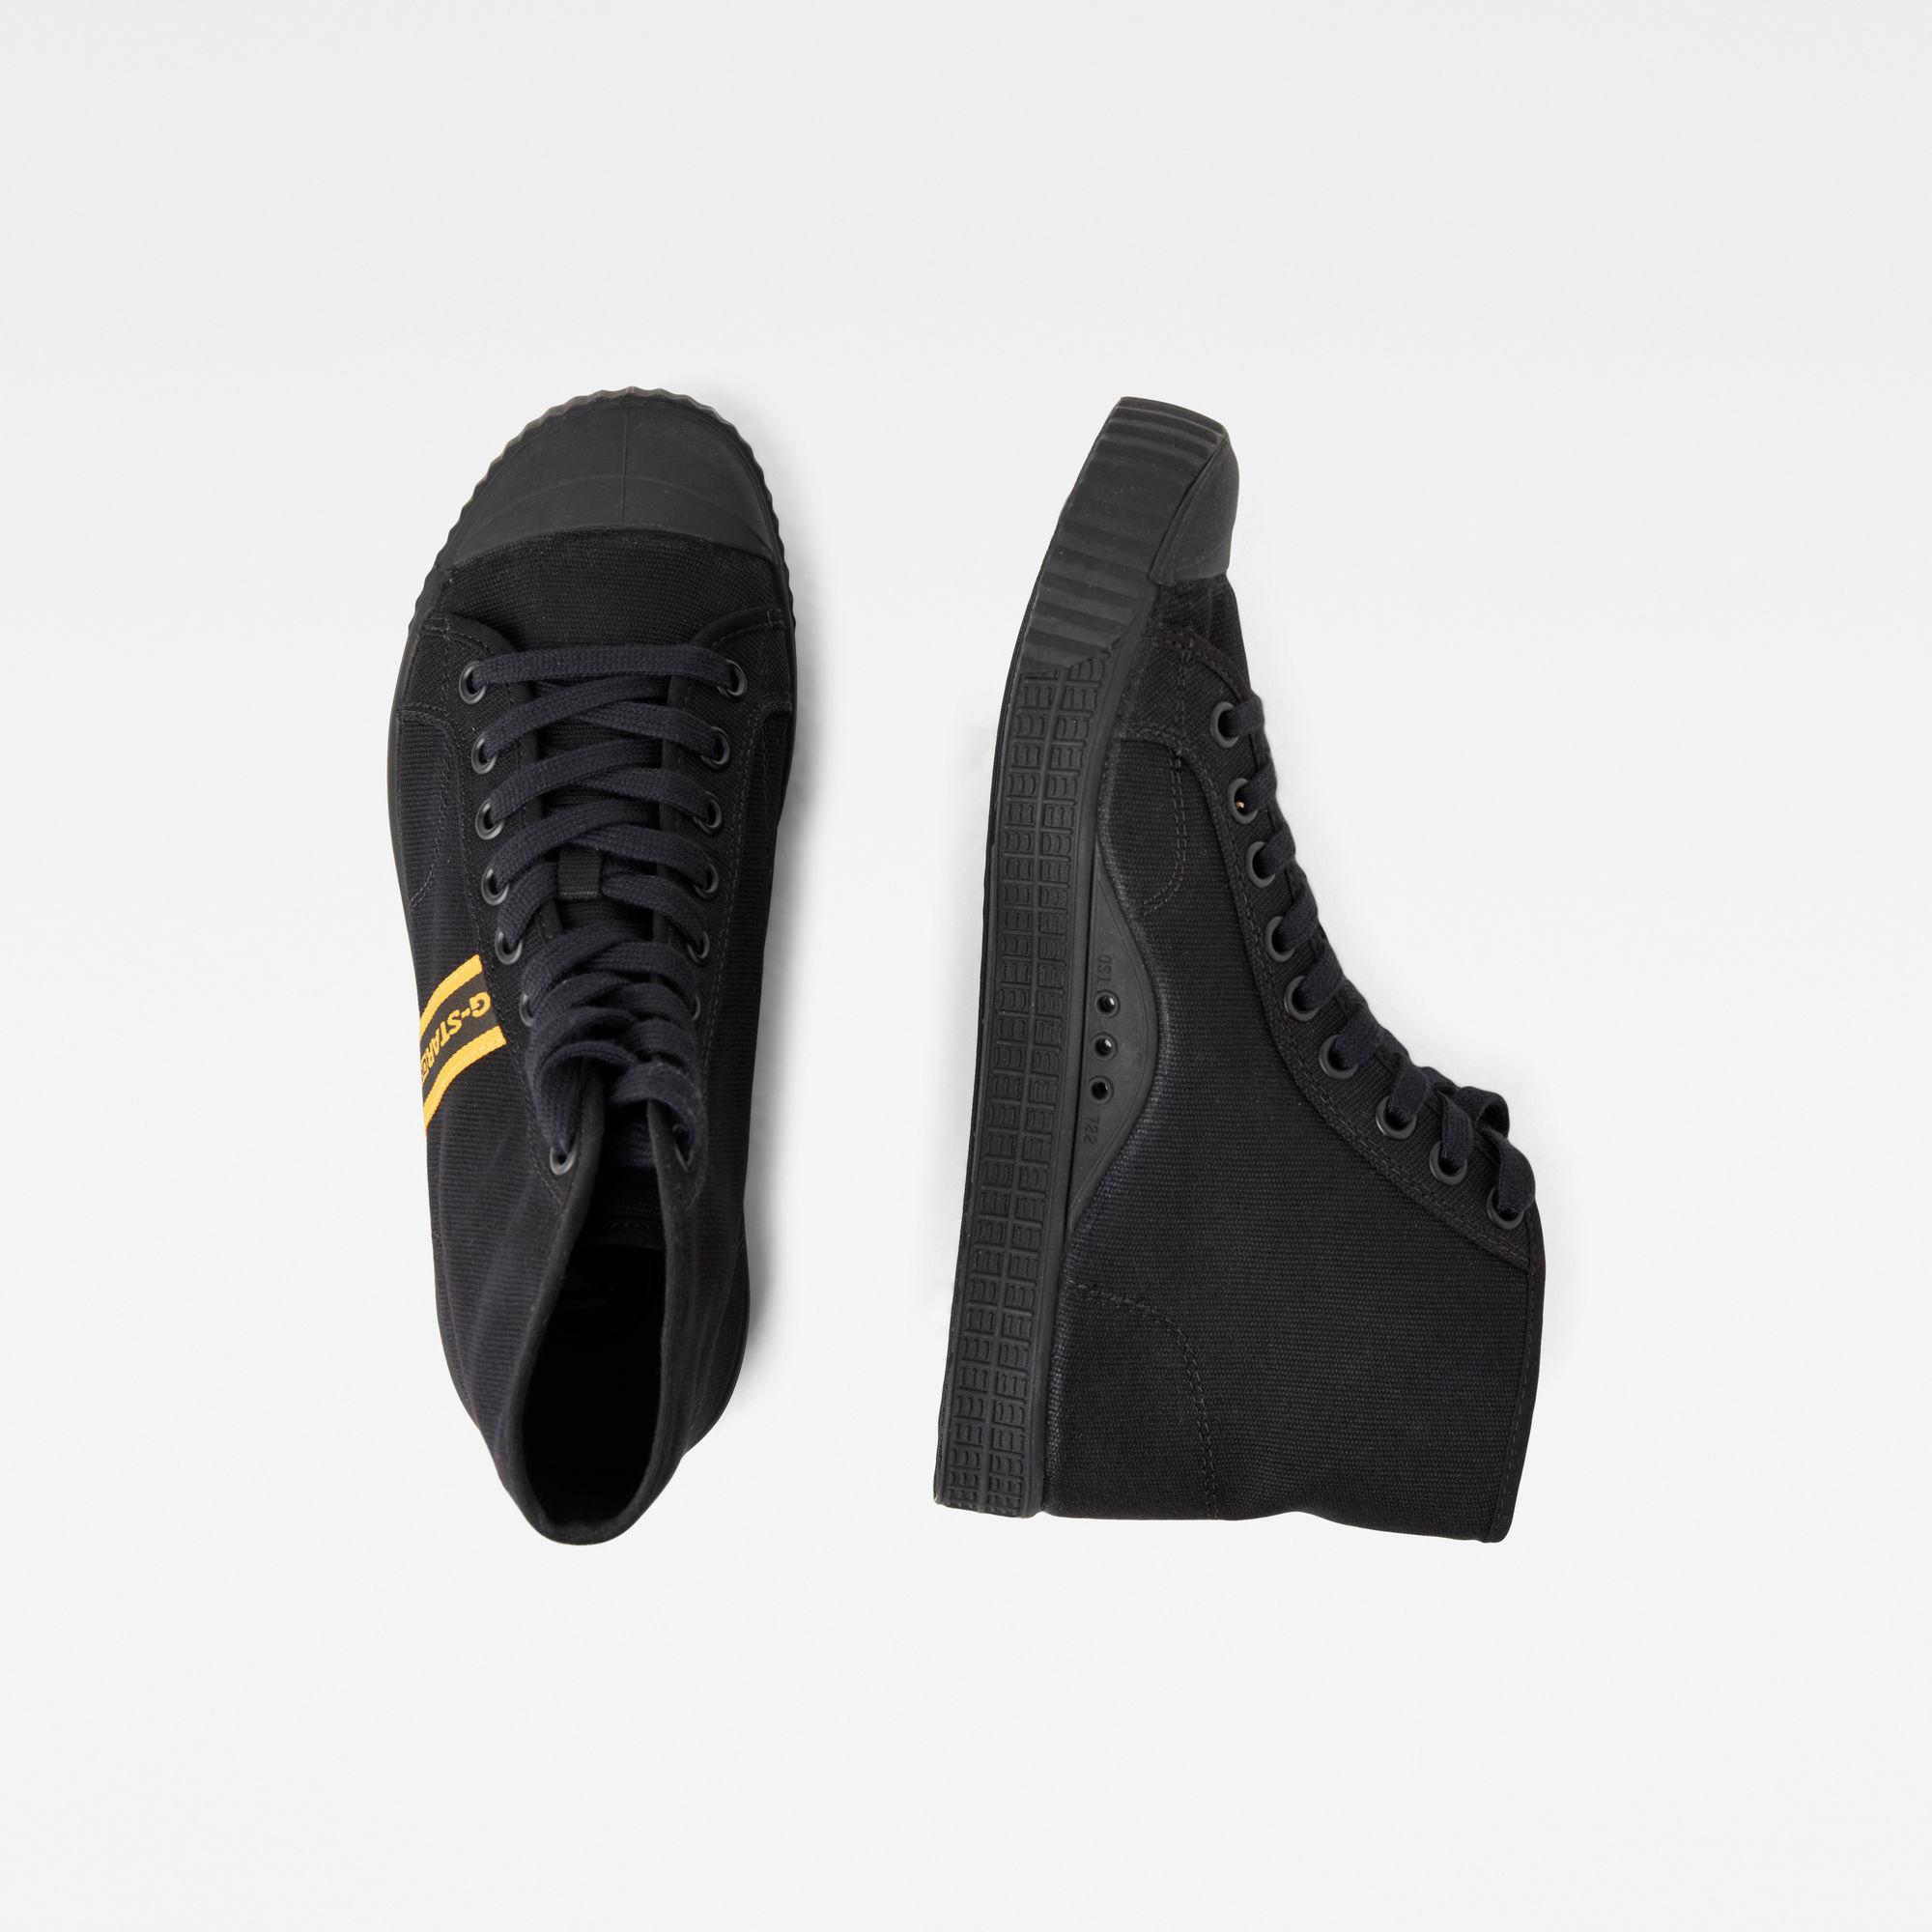 Rovulc OG II High Sneakers